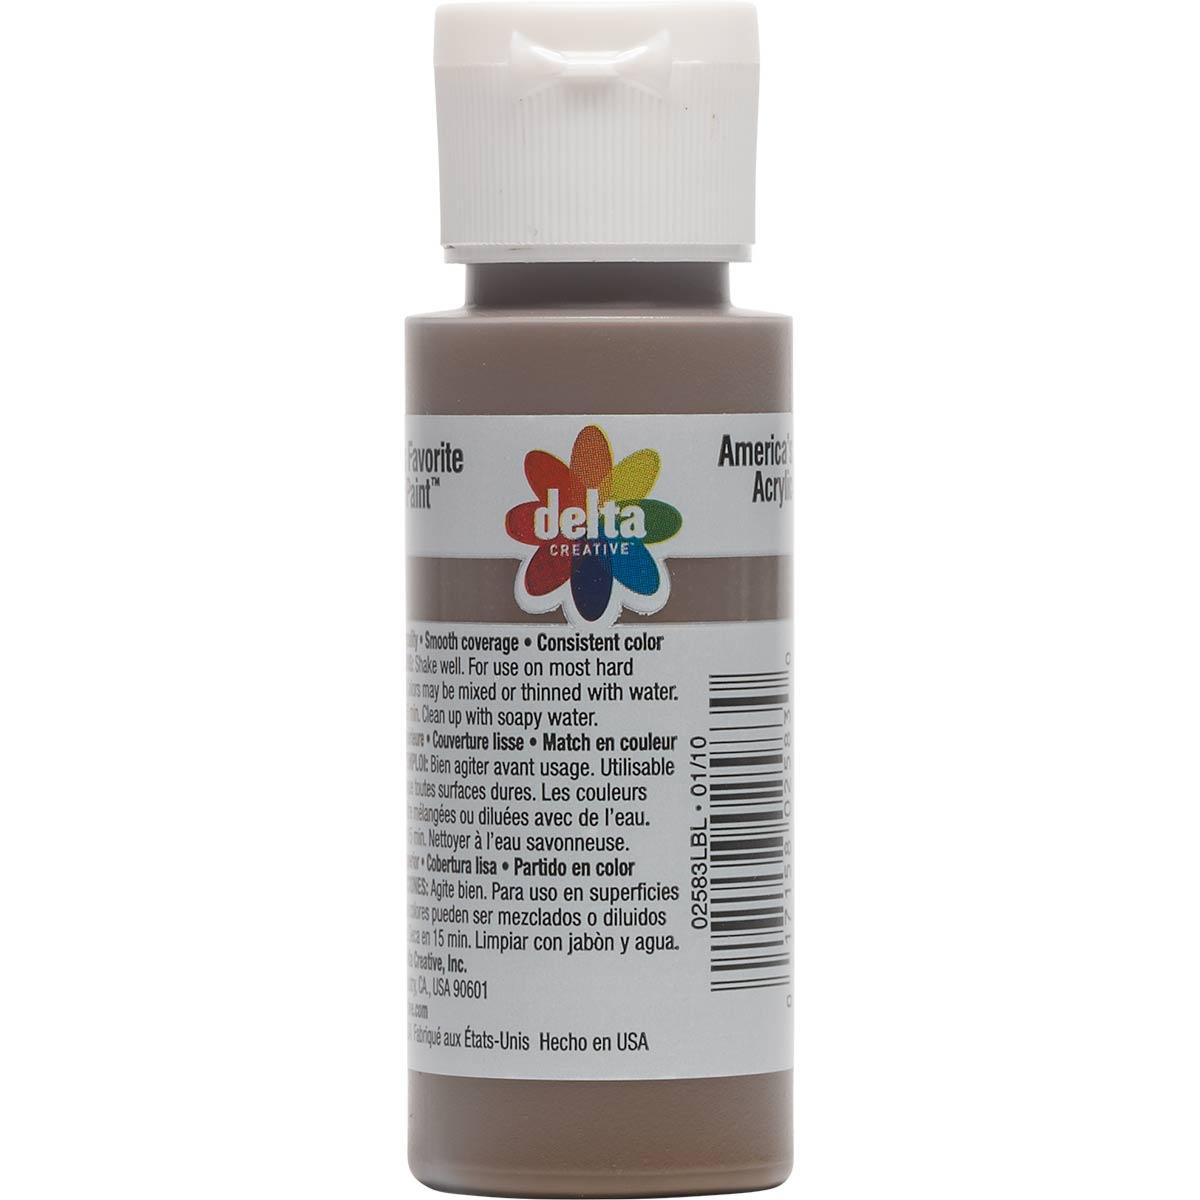 Delta Ceramcoat ® Acrylic Paint - Espresso, 2 oz. - 025830202W